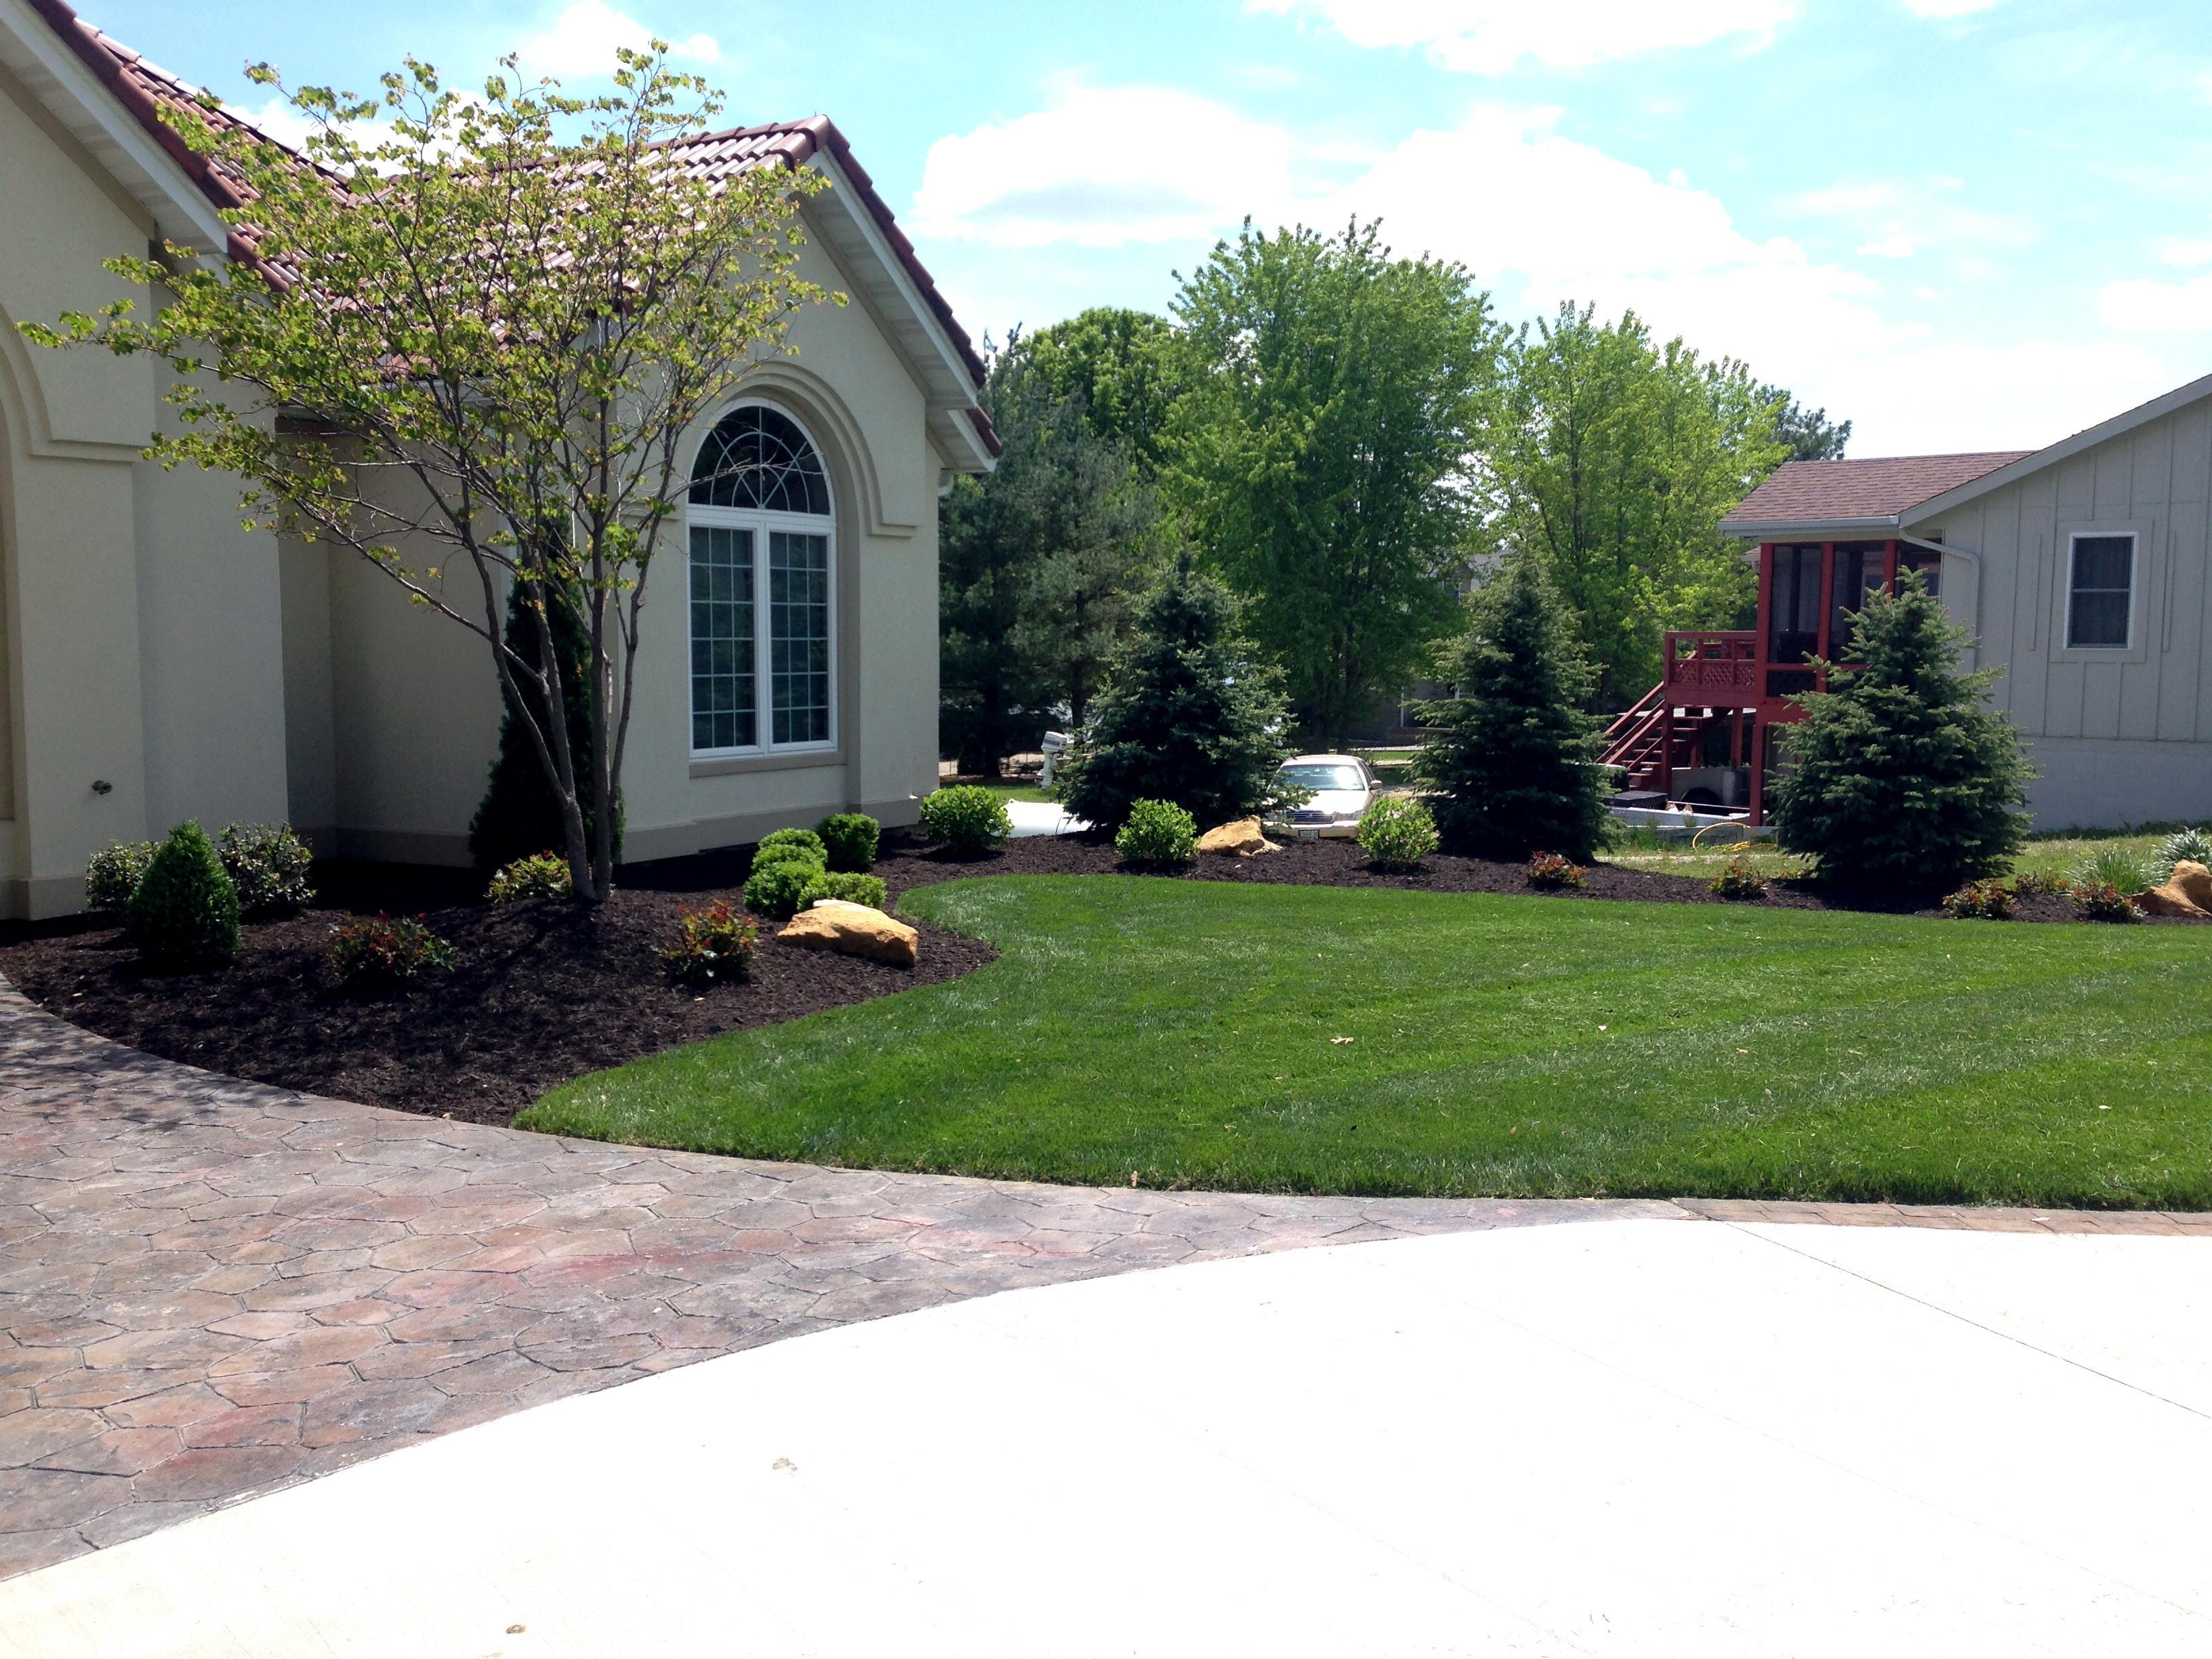 Bradford Street Lawn & Landscaping, LLC image 2